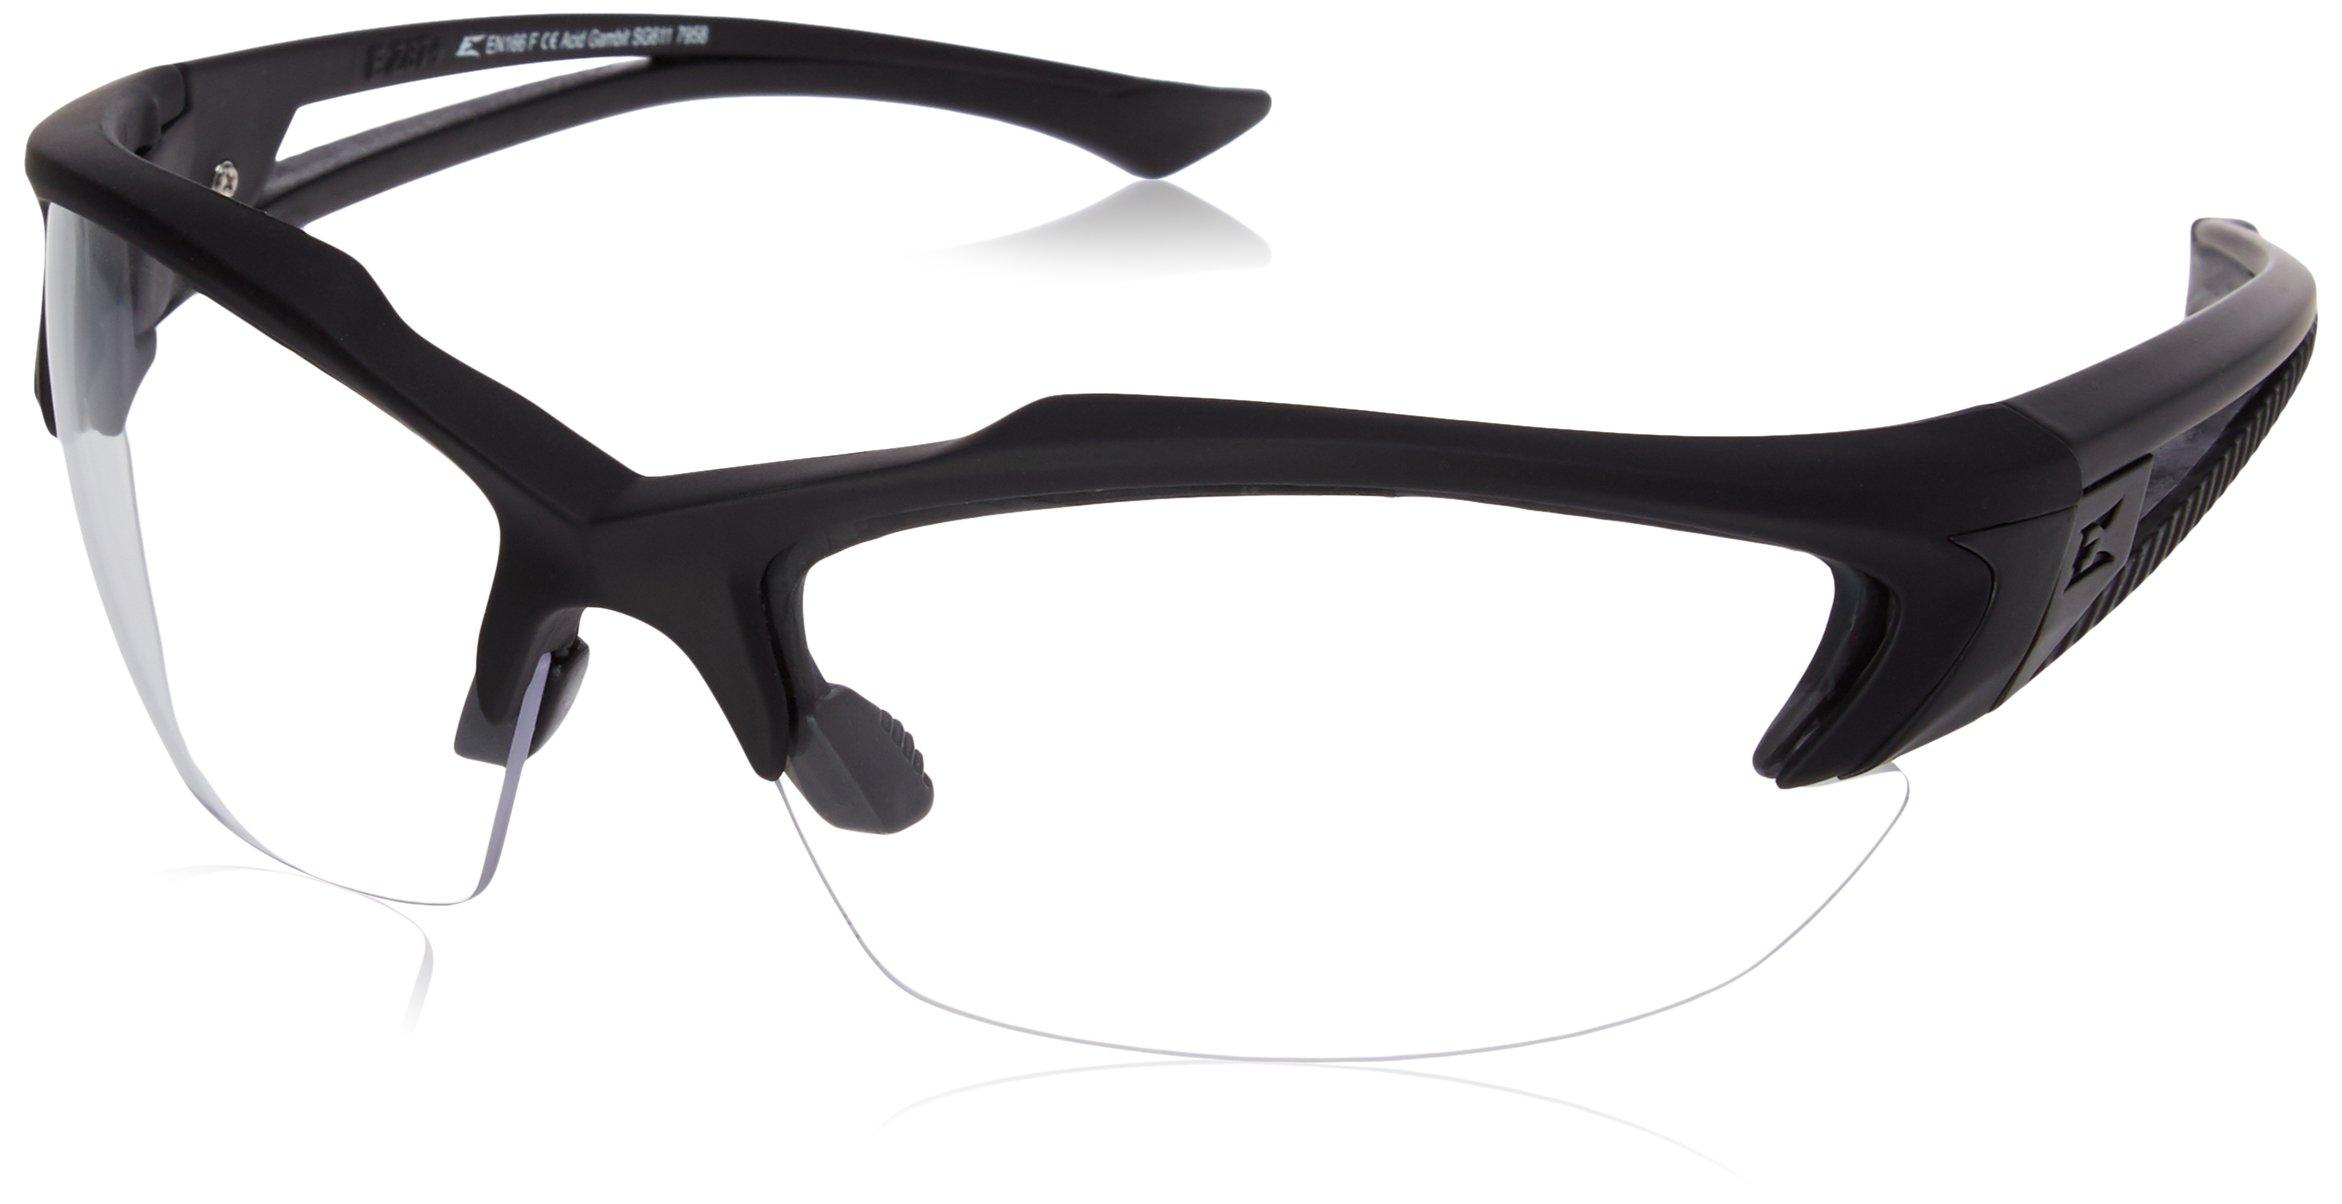 Edge Tactical Eyewear SG611 Acid Gambit Matte Black with Clear Lens by Edge Eyewear